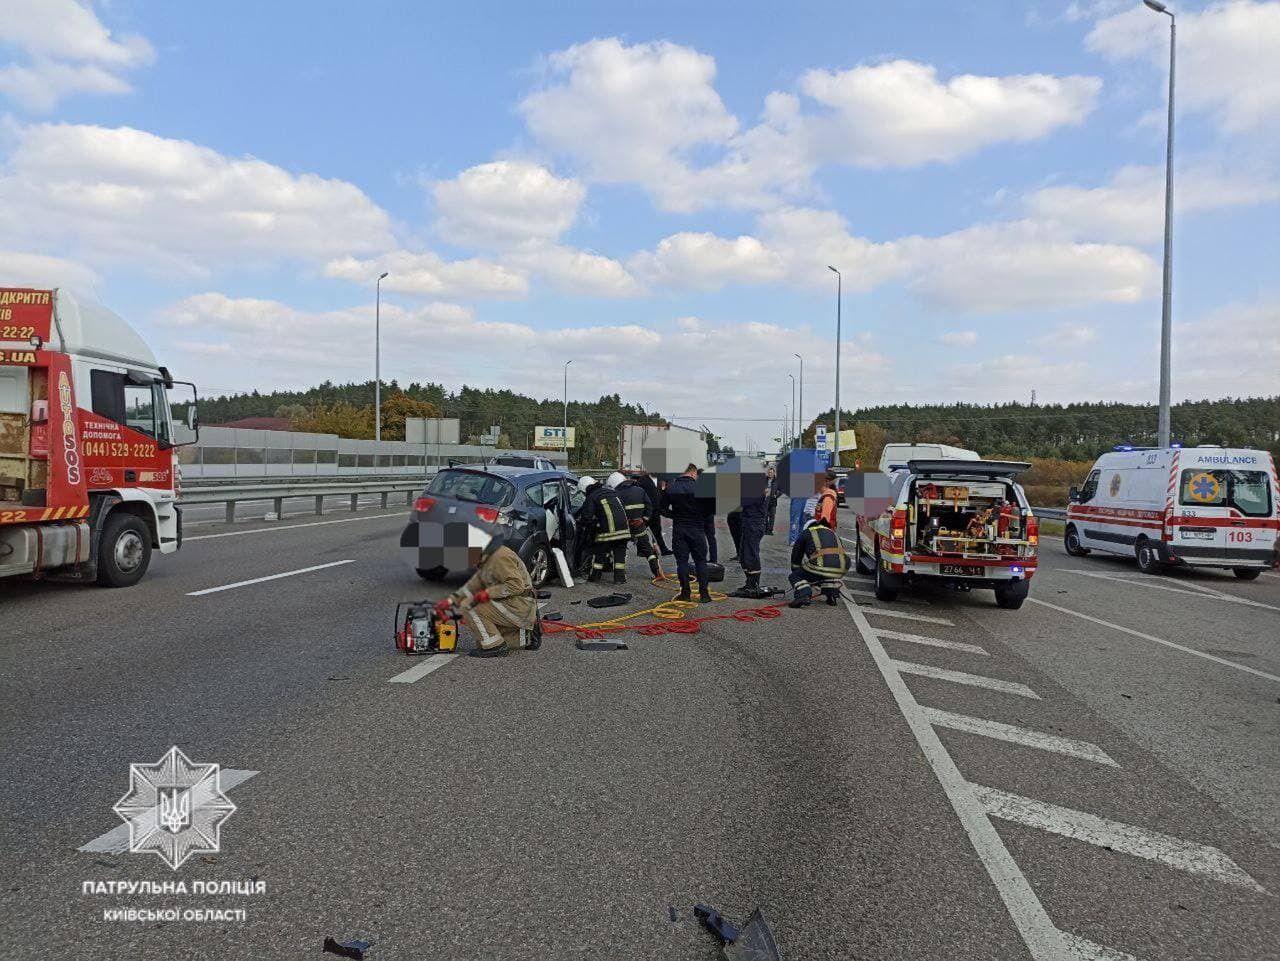 Одному участнику ДТП медики оказали помощь на месте аварии.